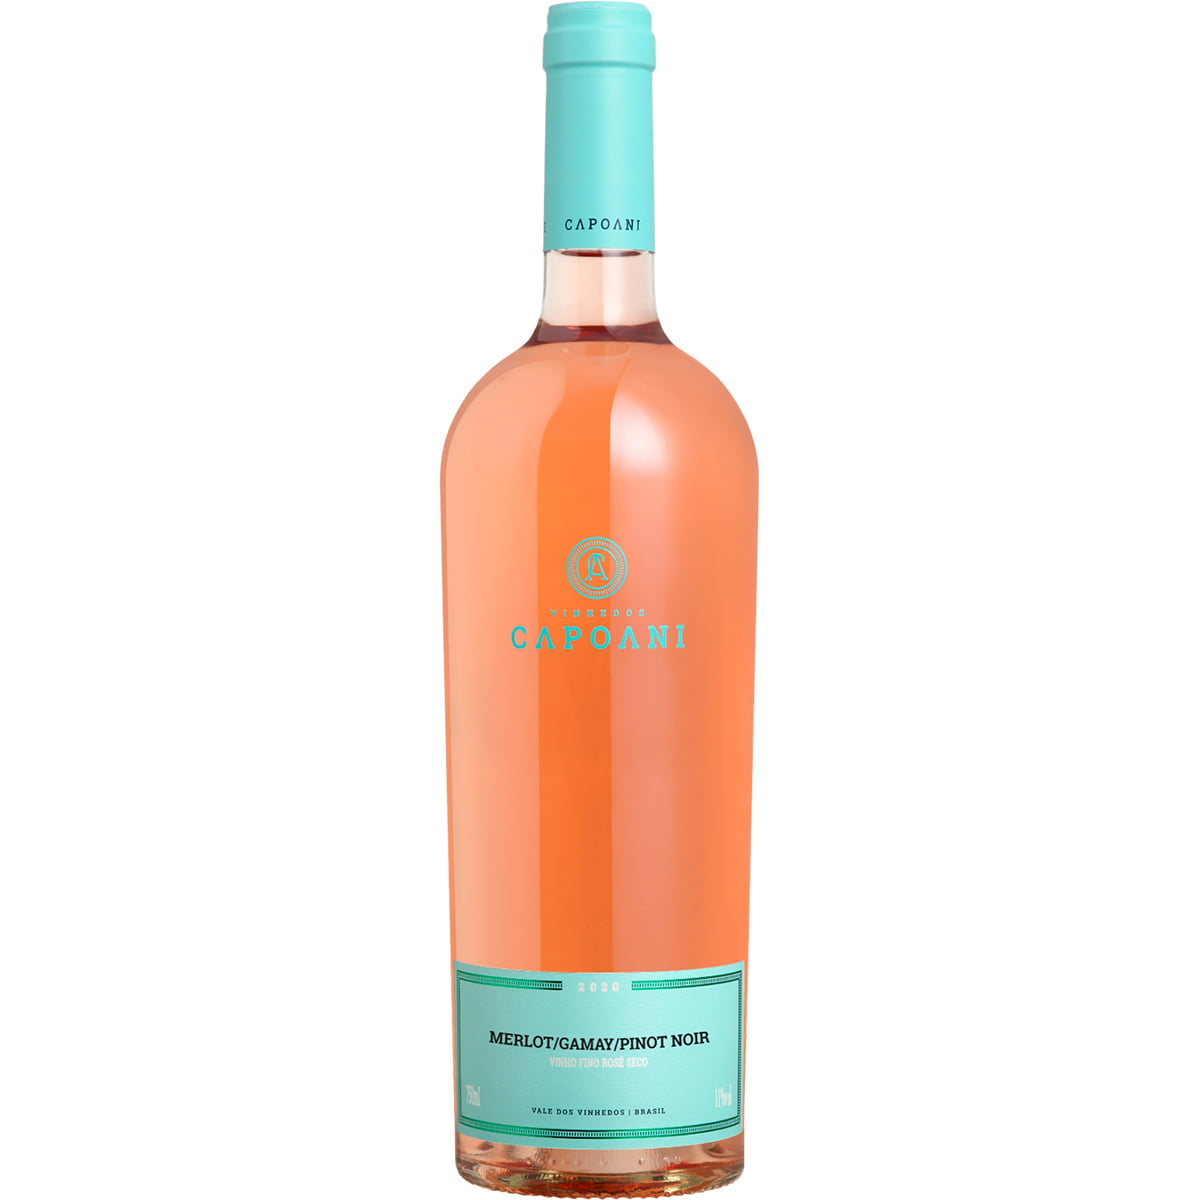 Vinho Capoani Merlot/Gamay/Pinot Noir Rosé Seco 750ml